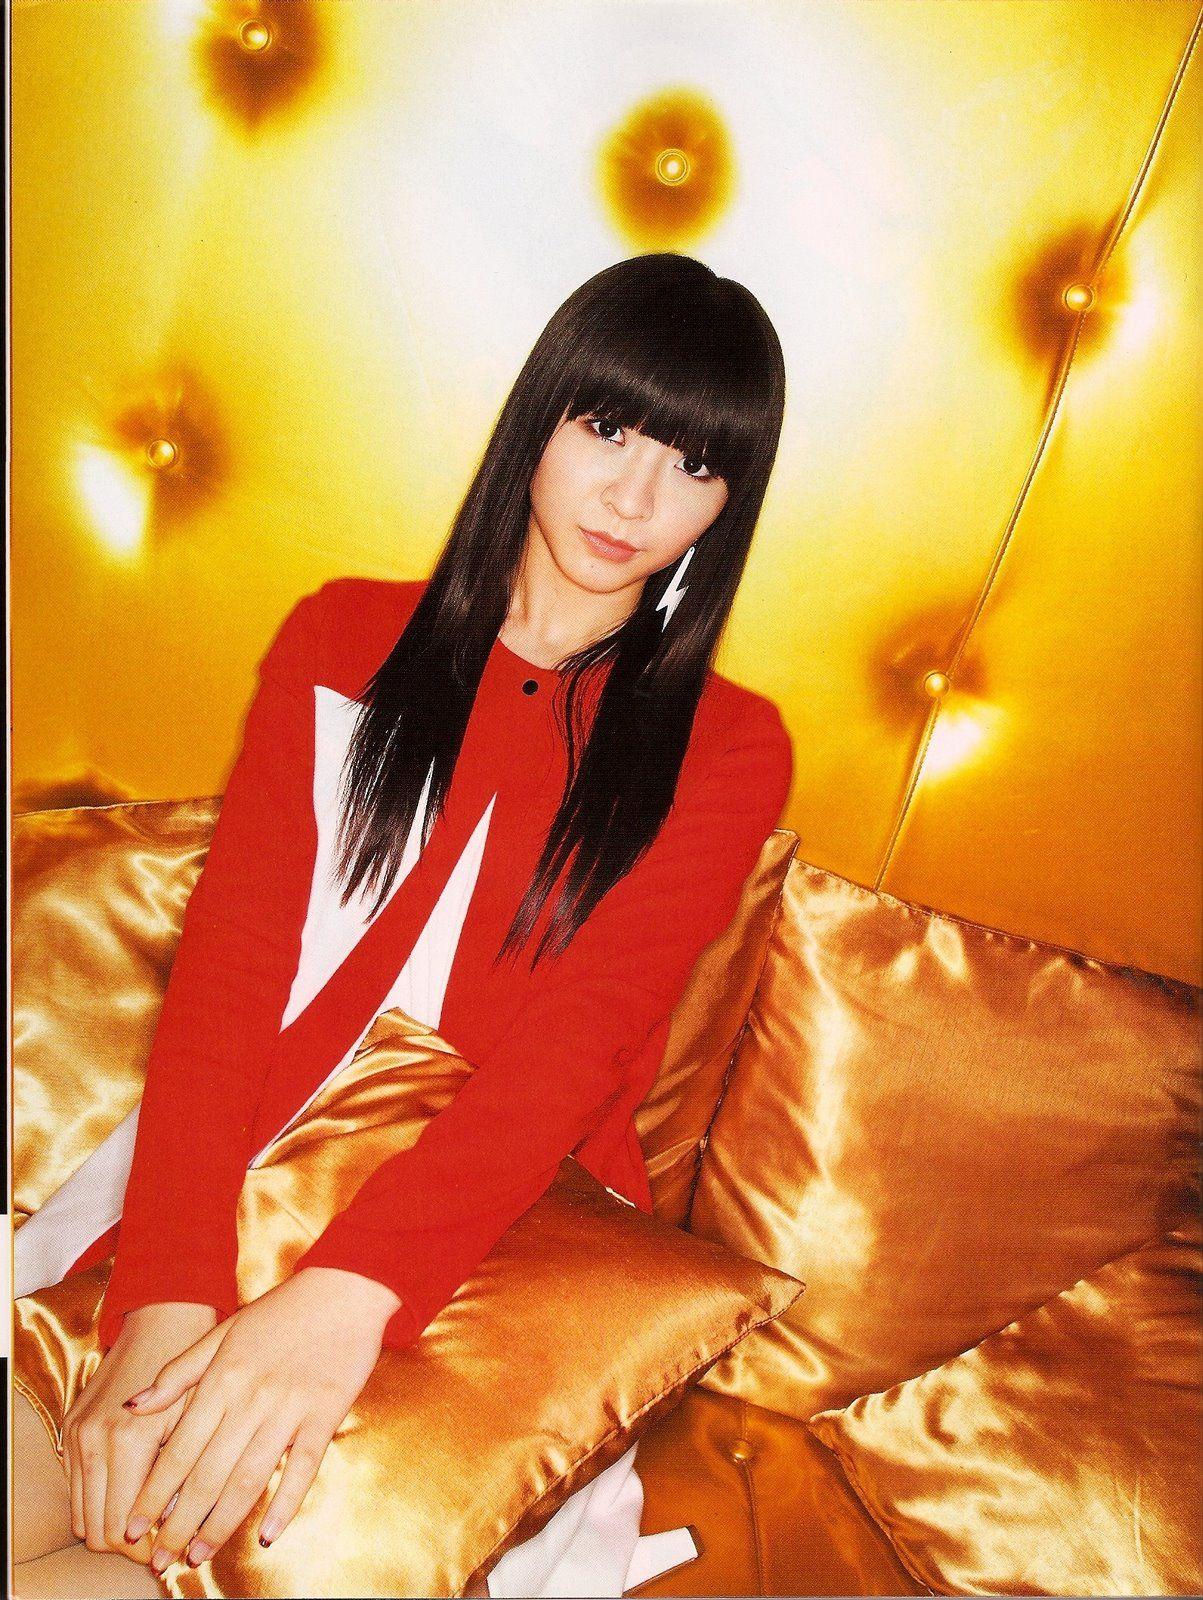 Perfume Experience おしゃれまとめの人気アイデア Pinterest Yunico Perfume かしゆか かしゆか Perfume 壁紙